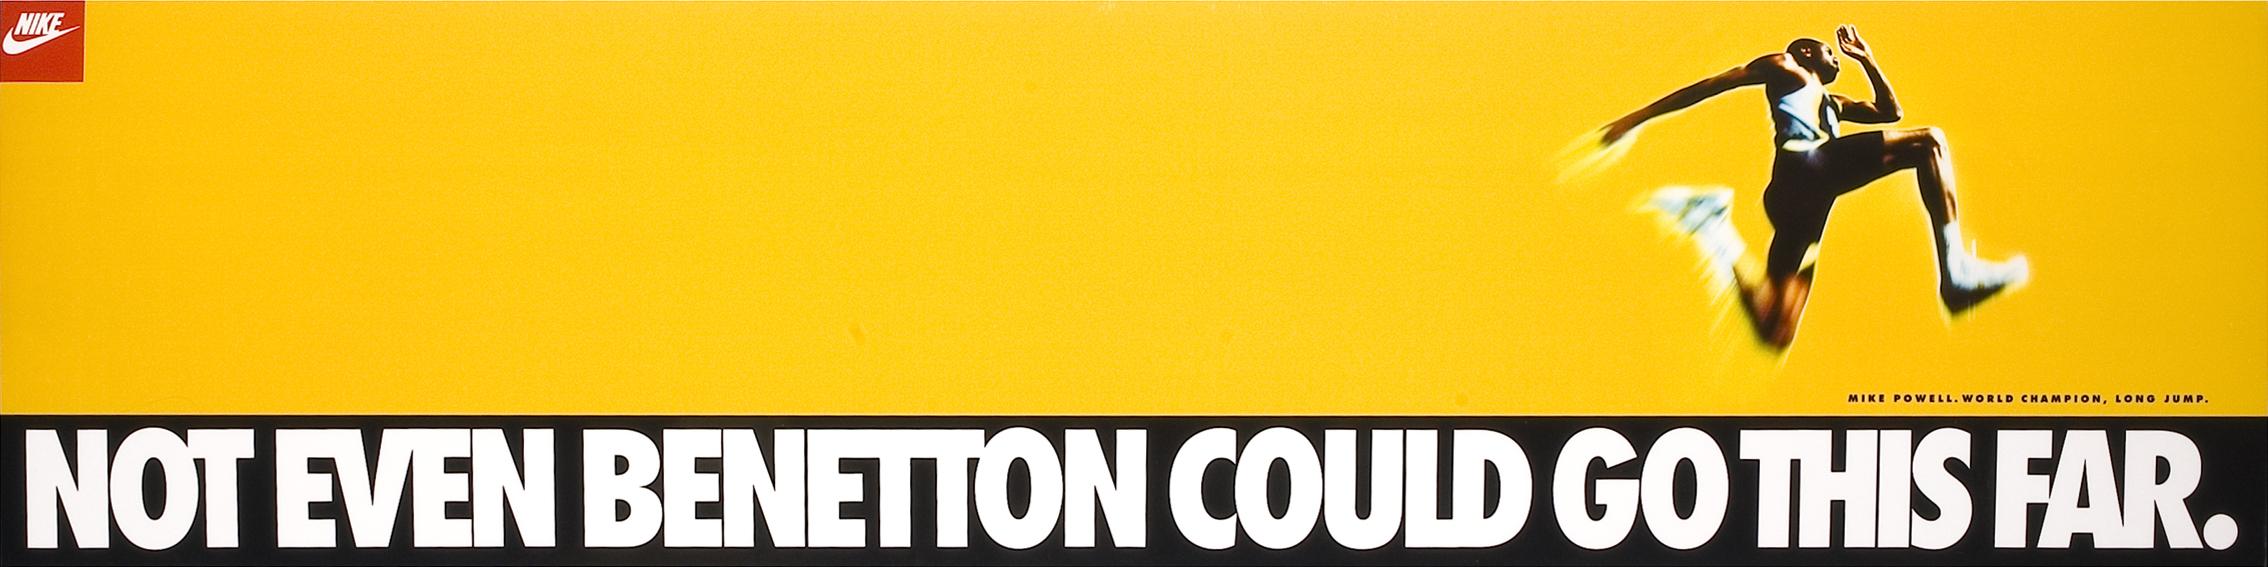 NIKE_Benetton